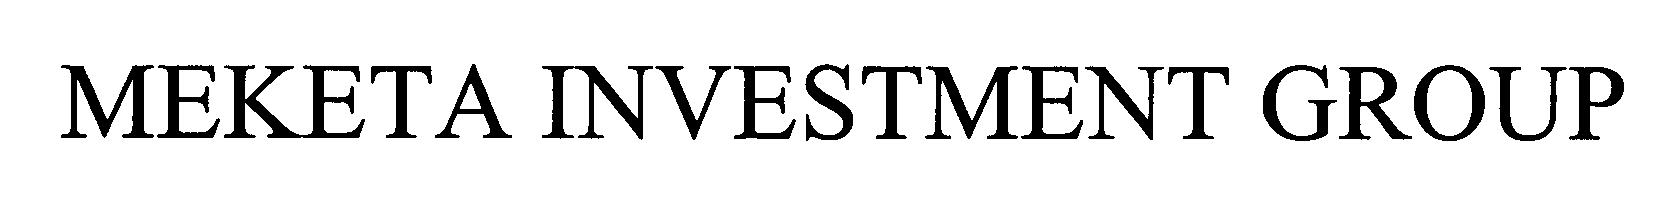 Meketa group investments simple effective forex trading strategies